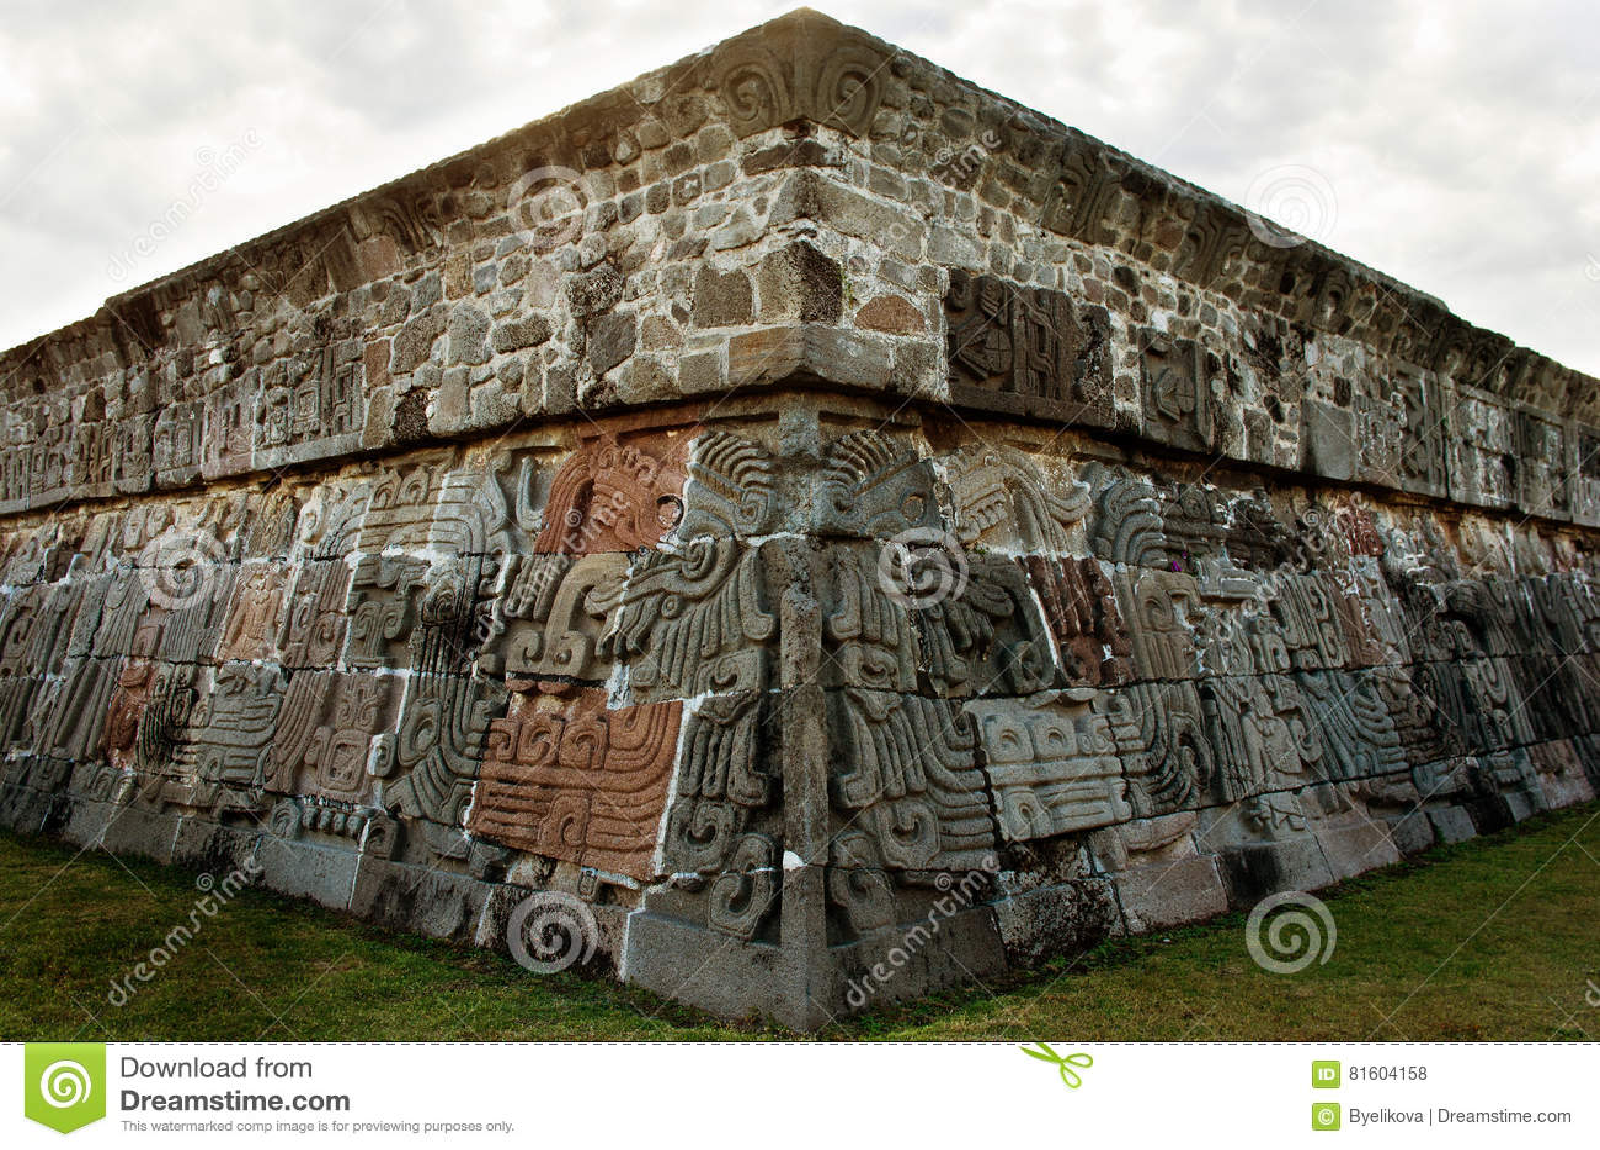 Templo de la serpiente emplumada en Xochicalco, México